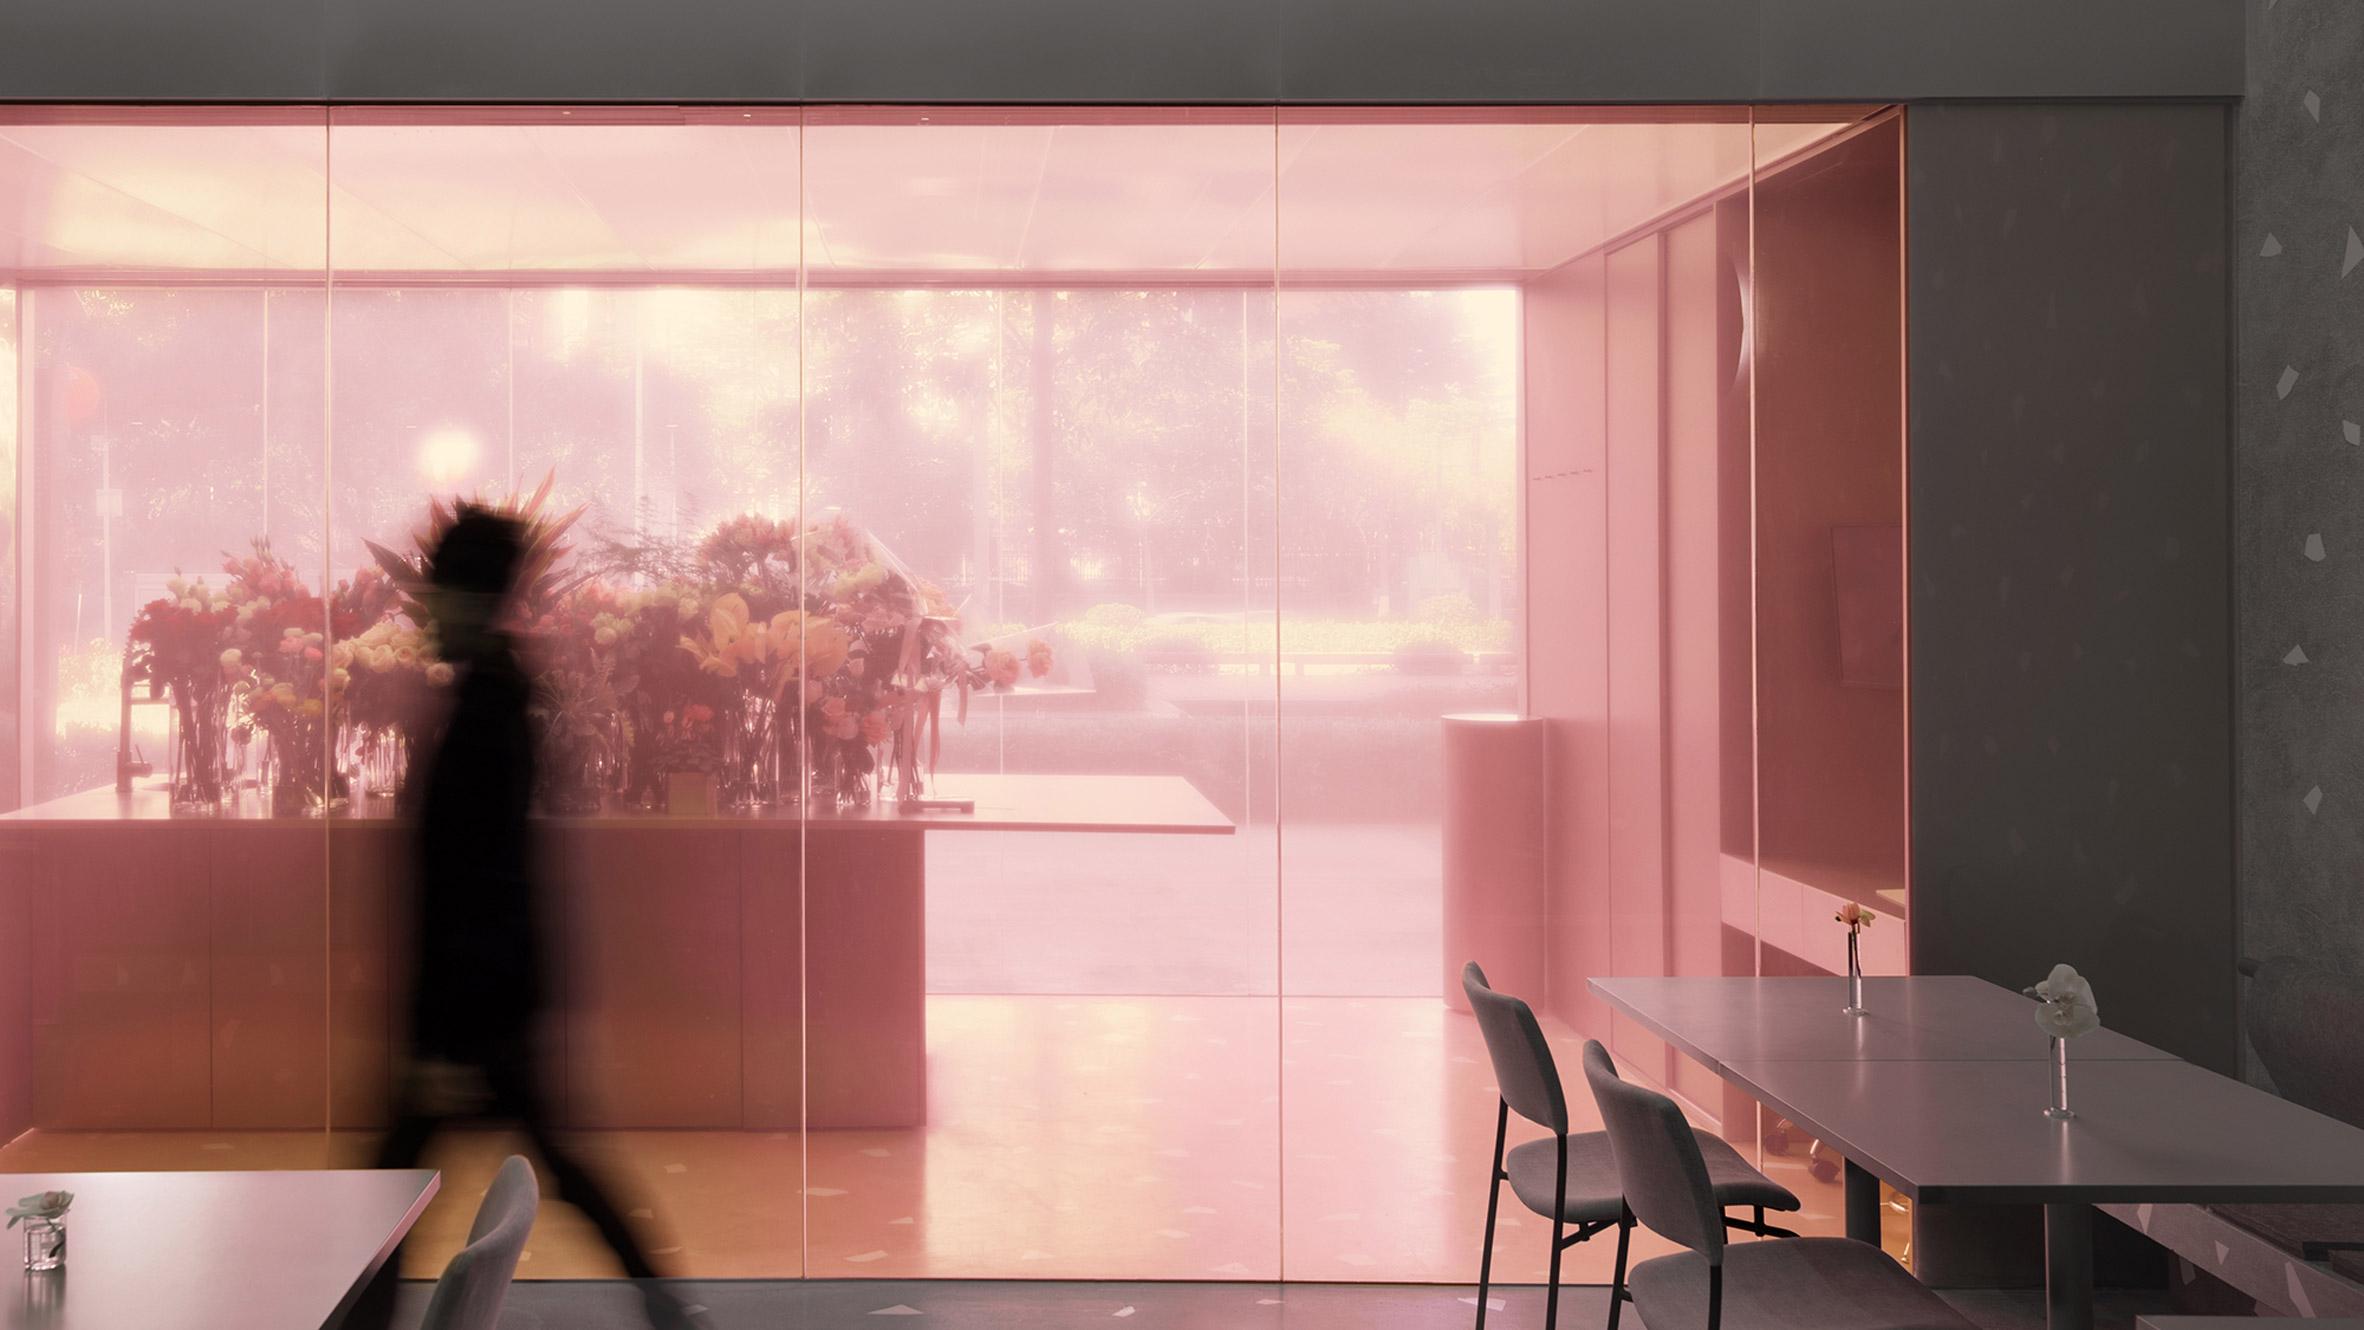 Translucent Pink Box Encloses Florist At Restaurant In Southern China